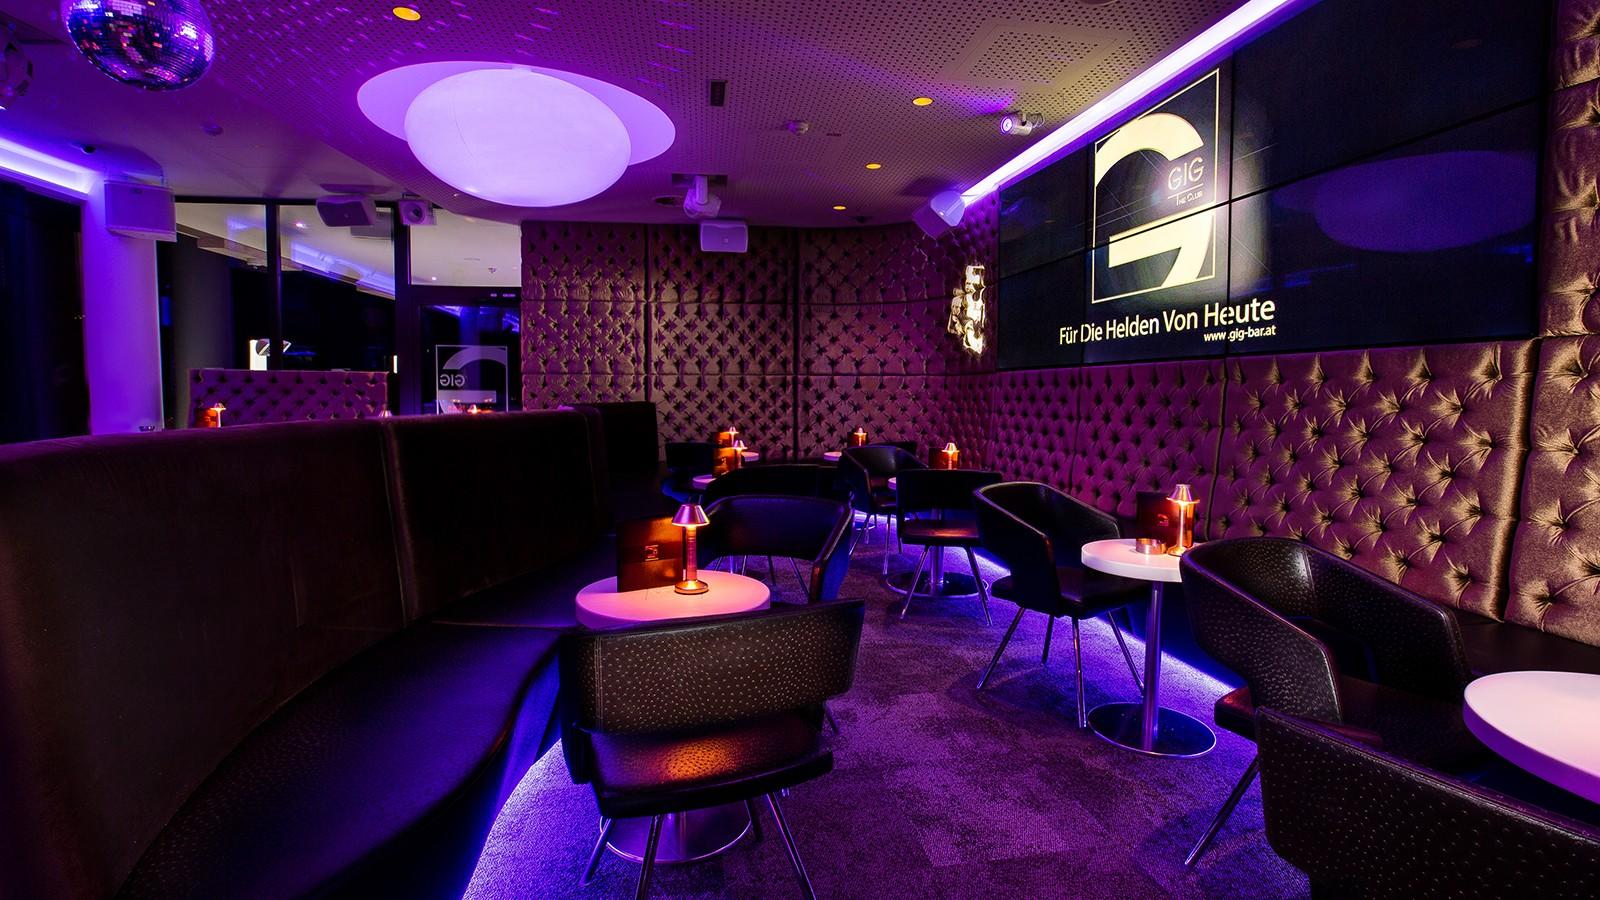 GIG Bar & Cafè Klagenfurt